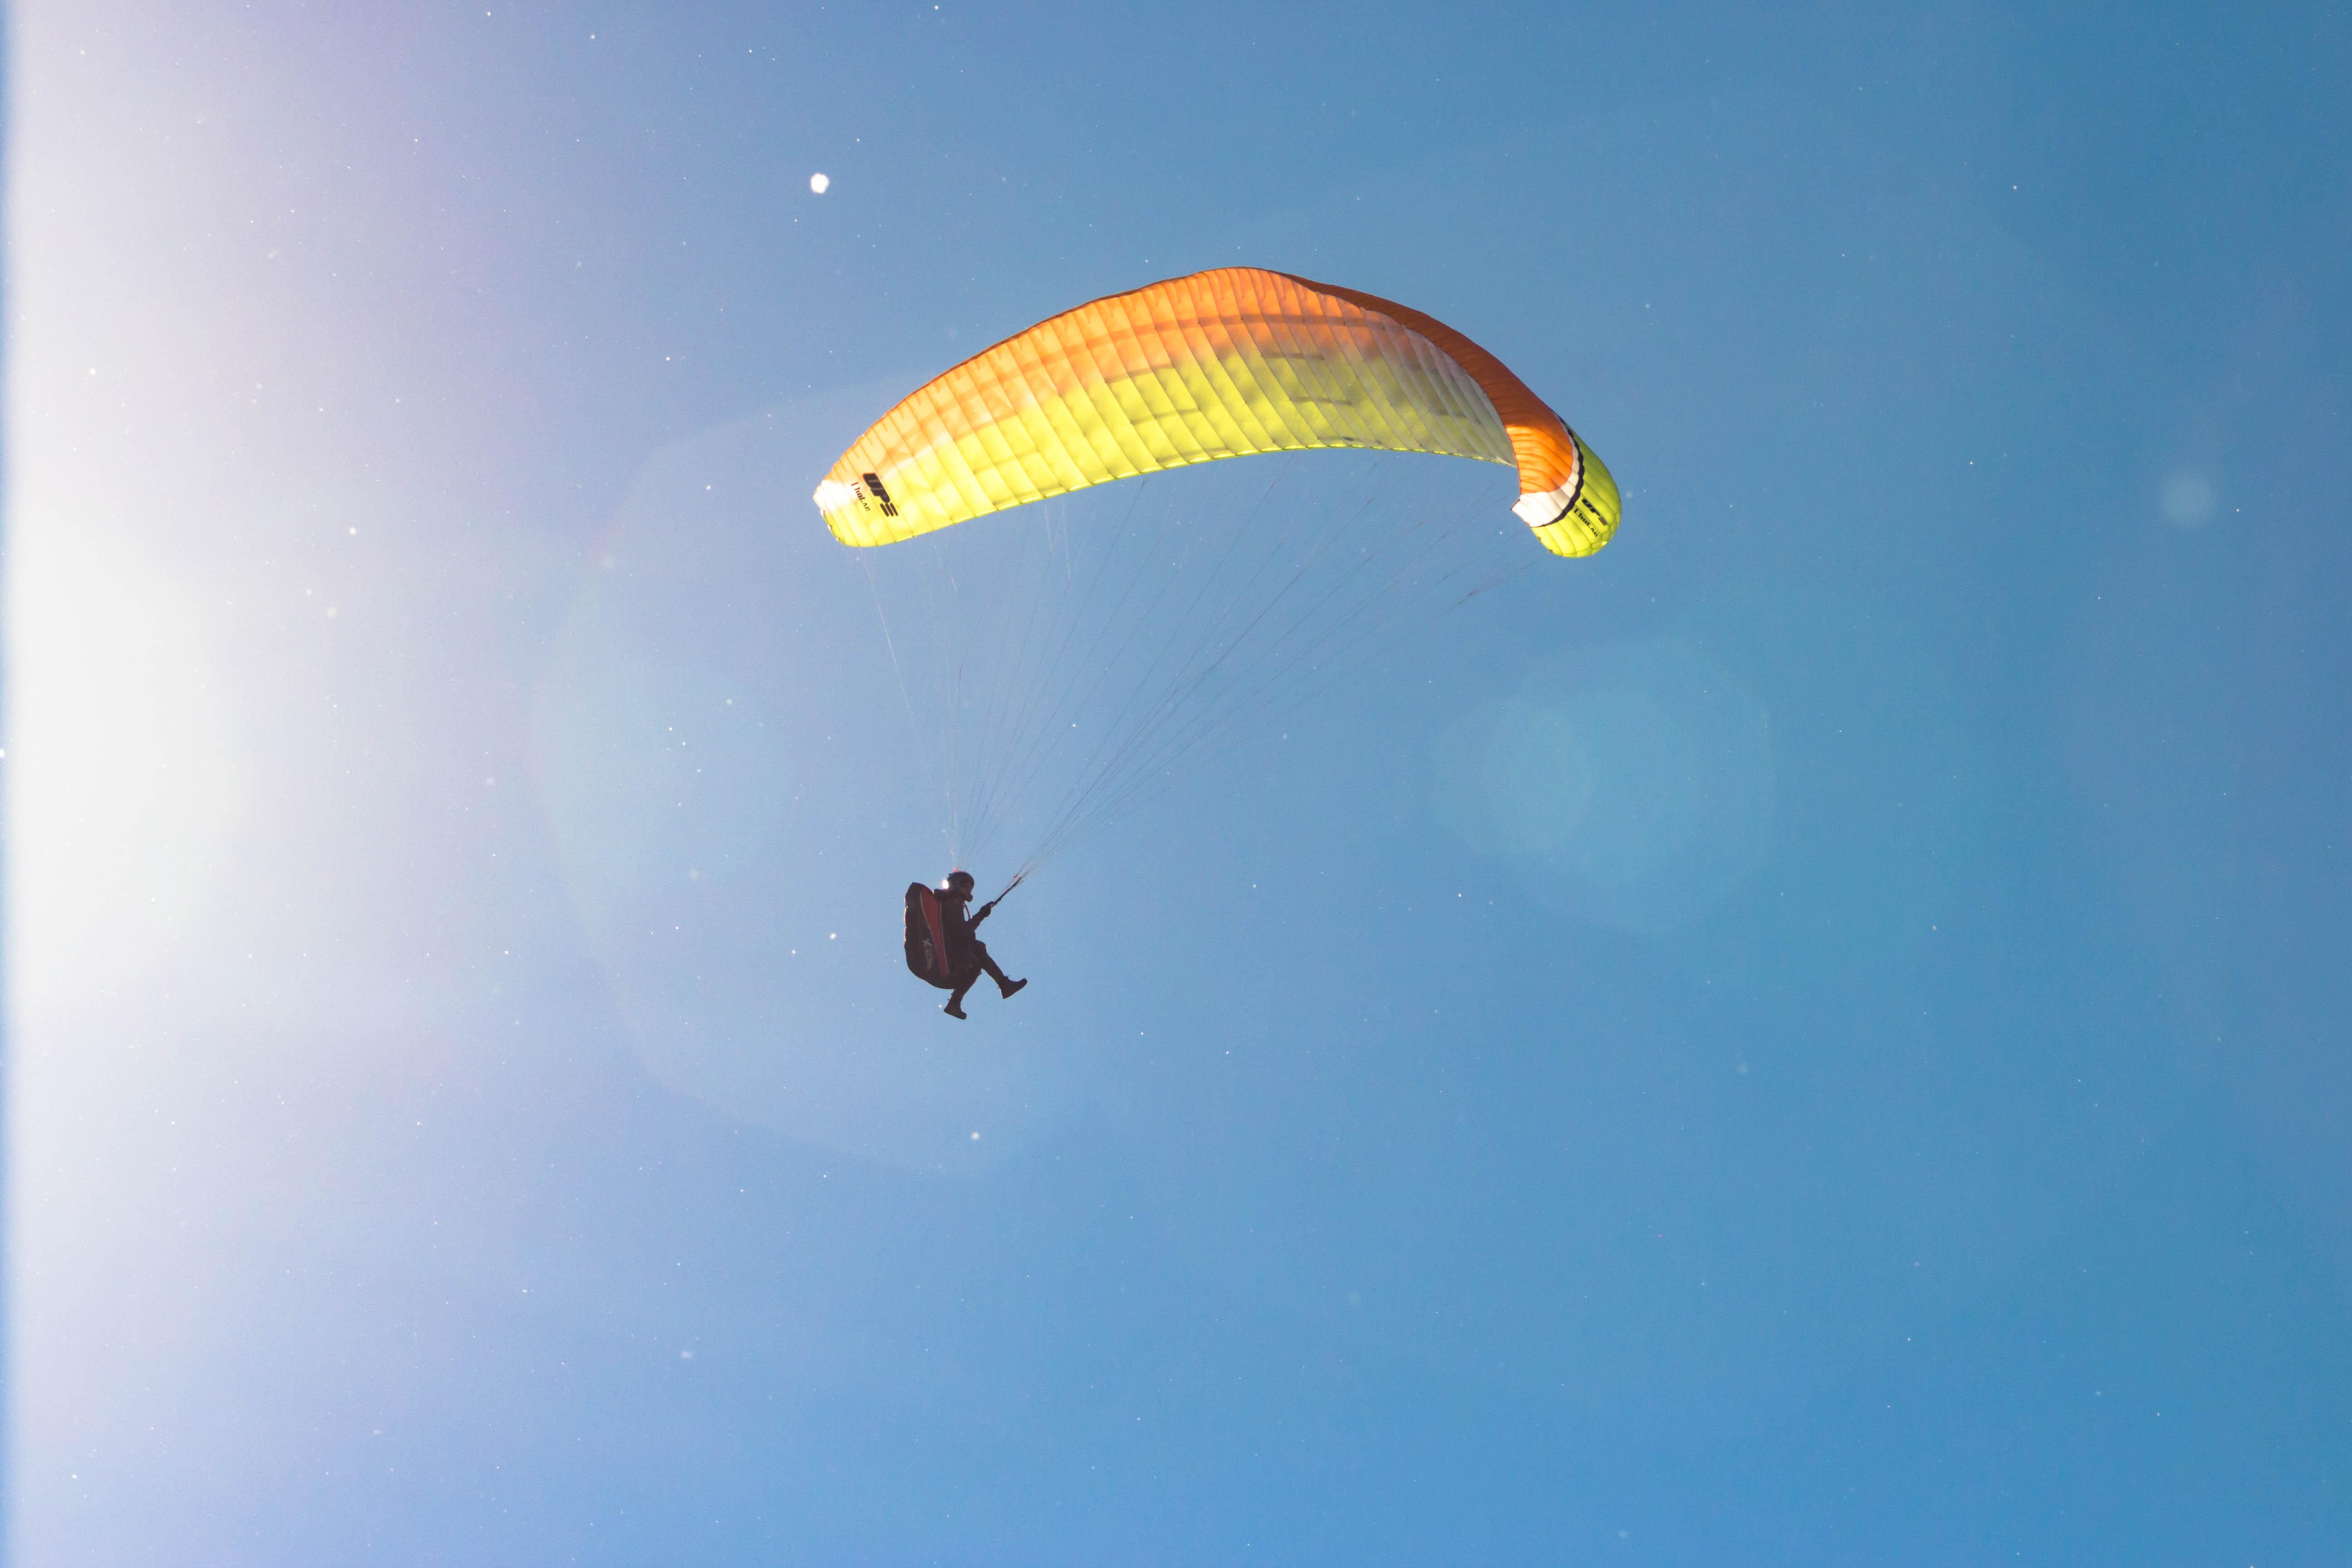 Paragliding Alaskan Skies